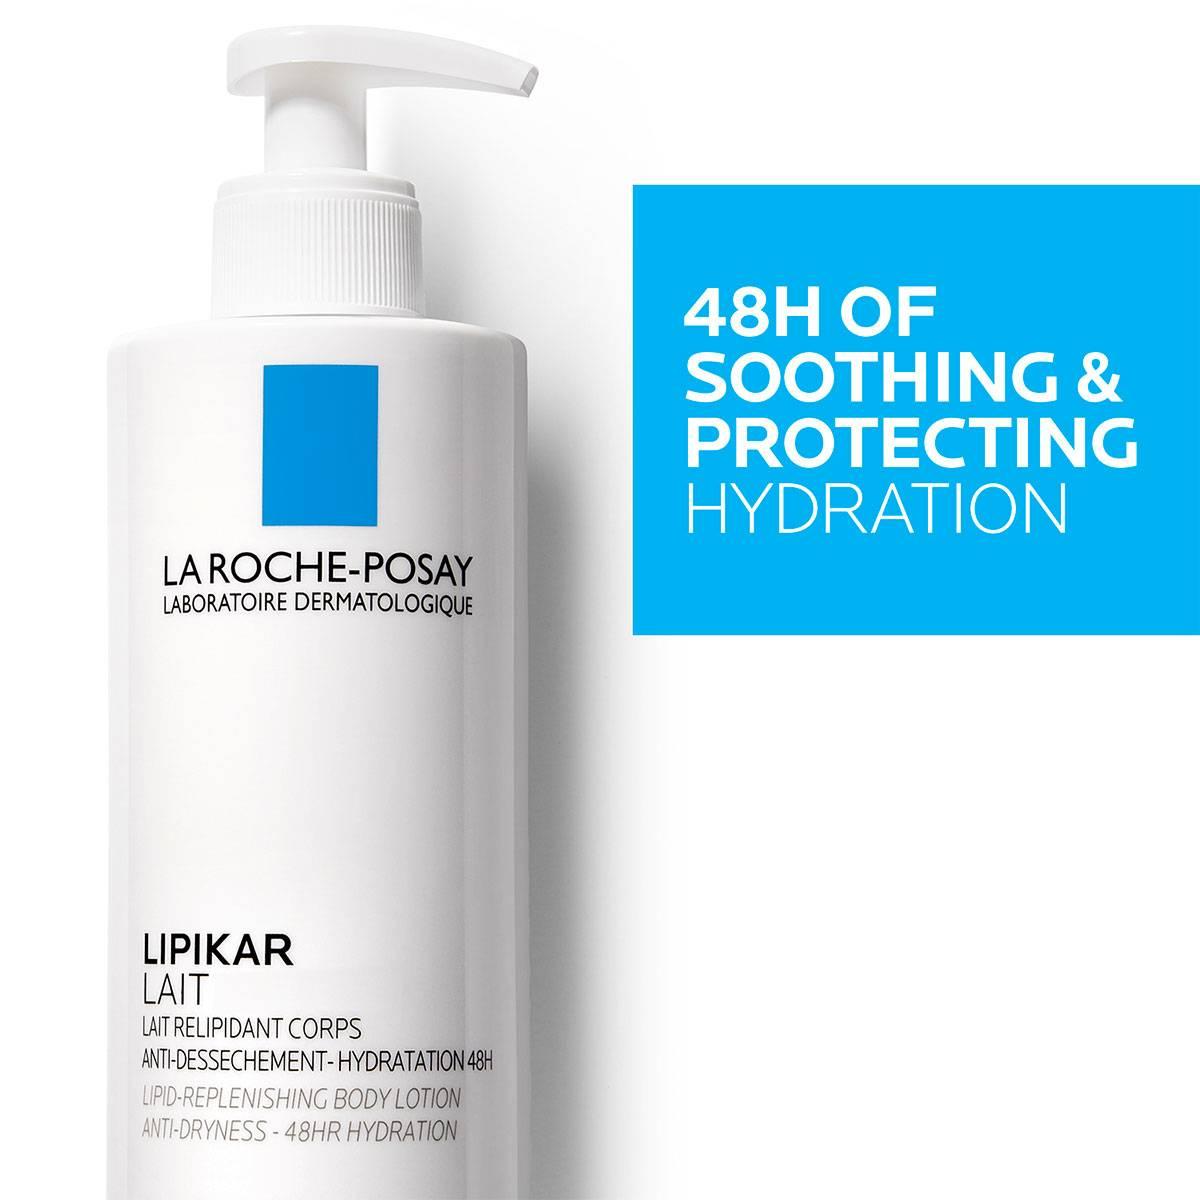 Larocheposay ProductPage Eczema Lipikar Lait 400ml 3337875552127 Zoome